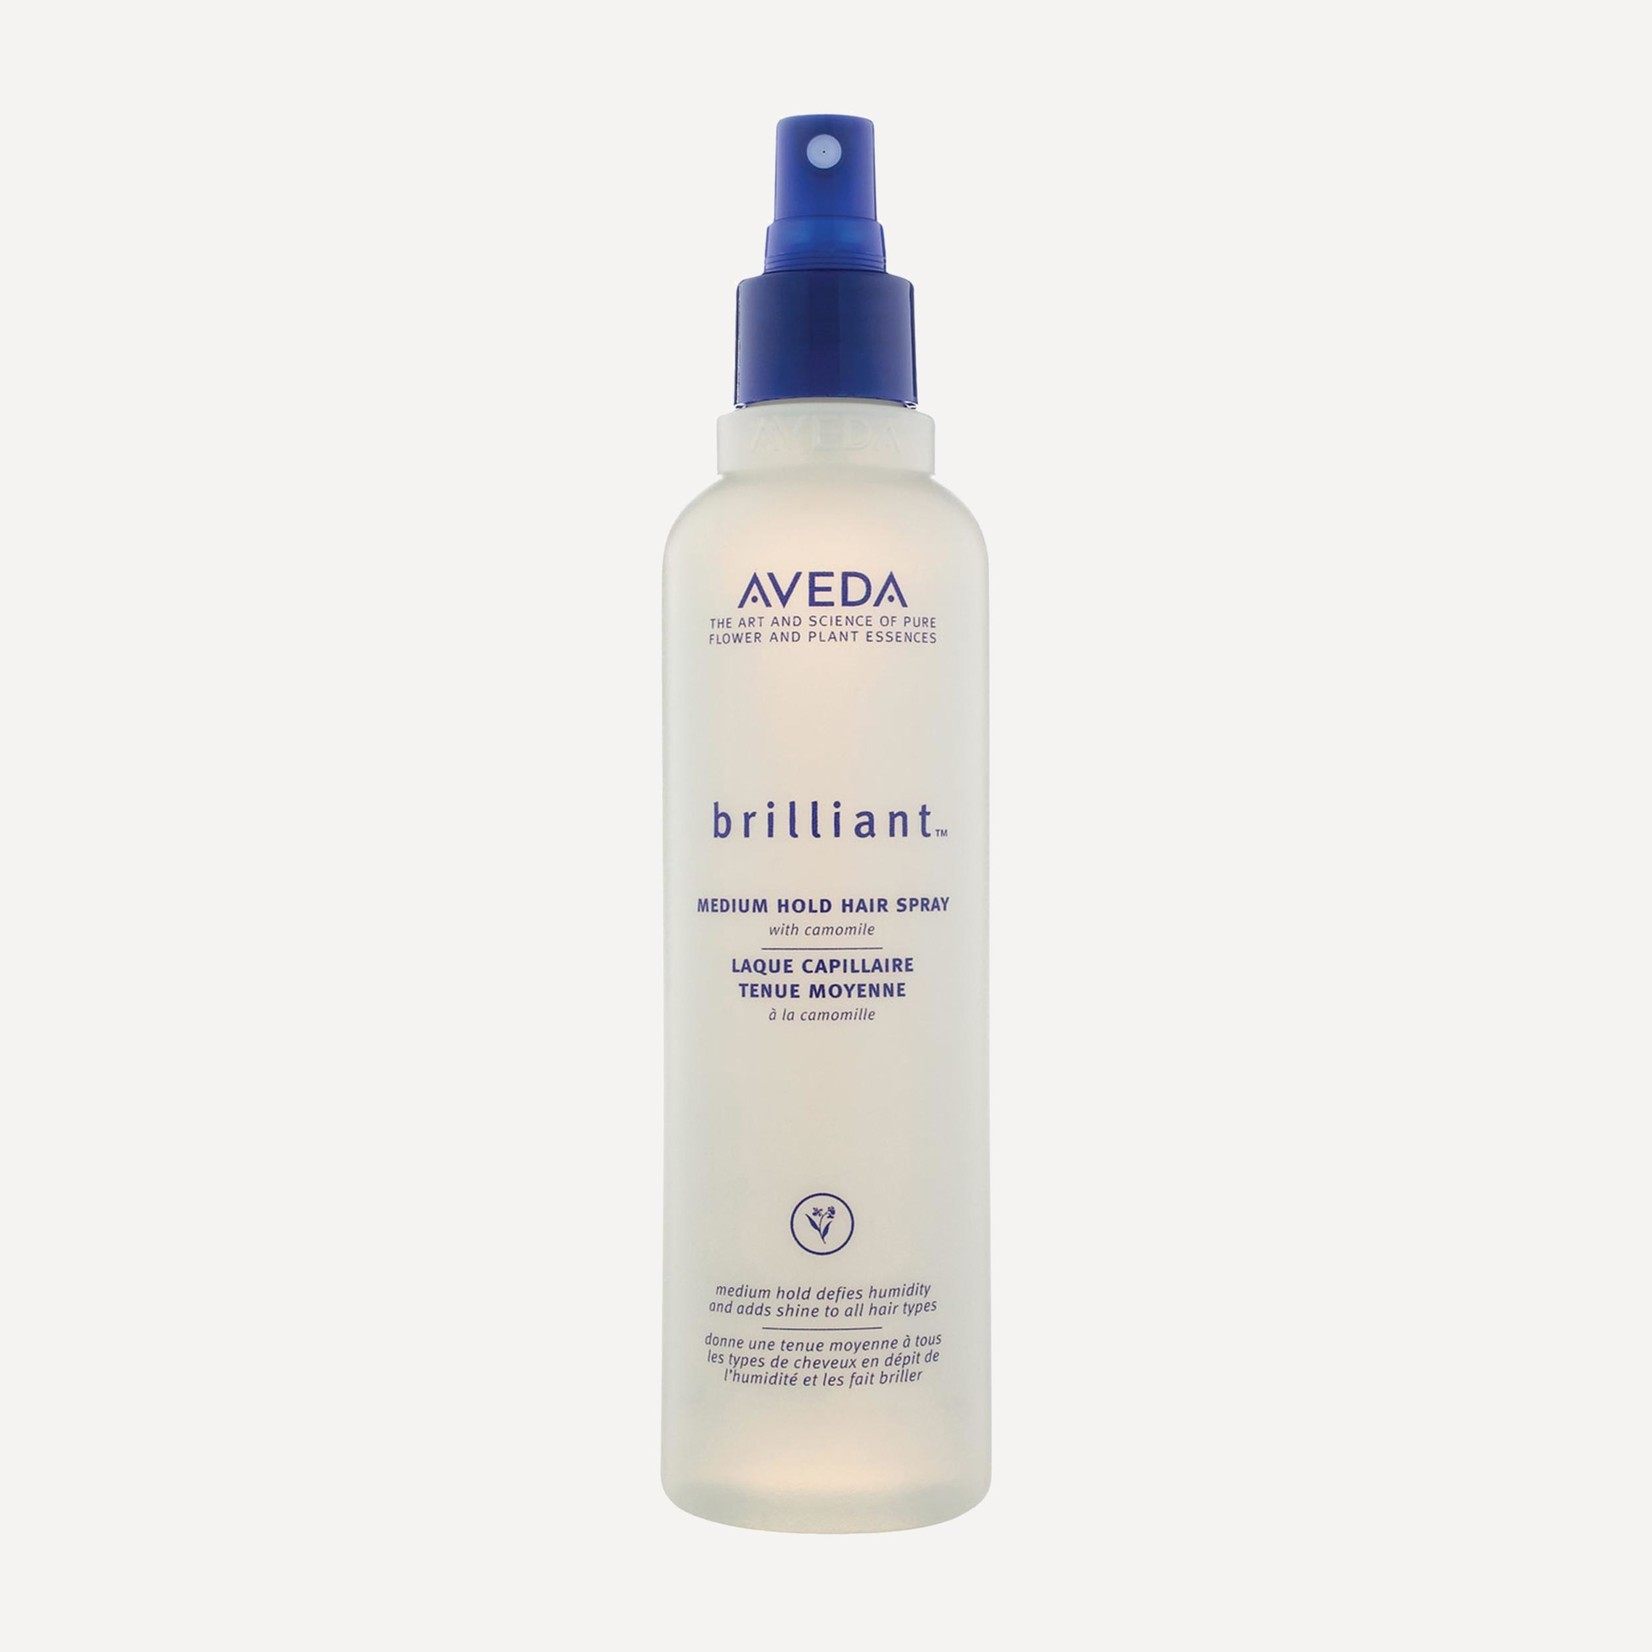 AVEDA Brilliant™ Medium Hold Hair Spray